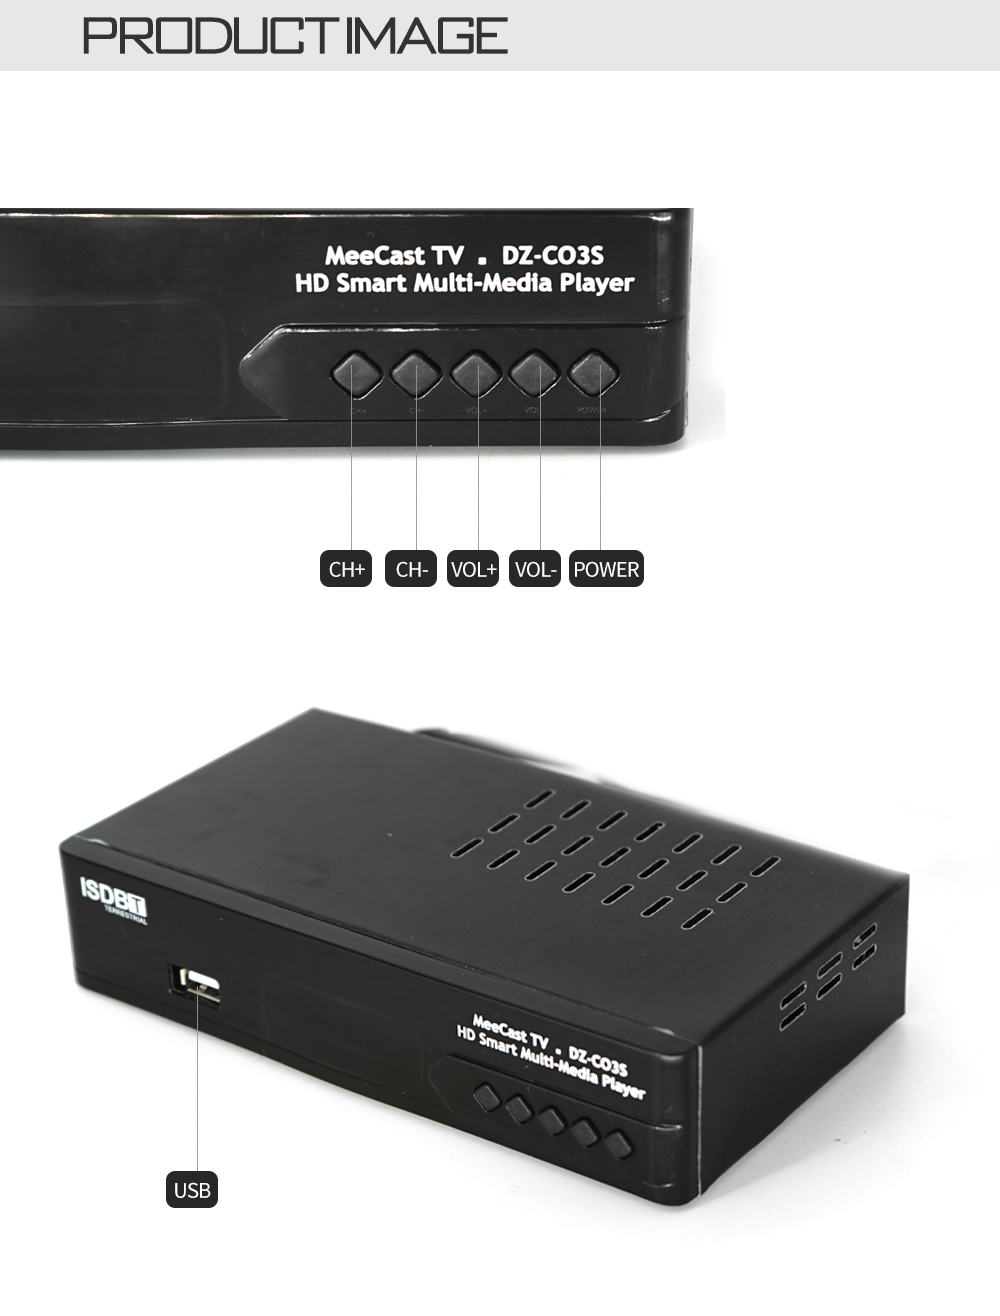 Digital Terrestrial ISDB-T TV Tuner Receiver Set-Top Box Fully HD 1080P H.264 USB Decoder Brazil Chile Peru Costa Rica 16